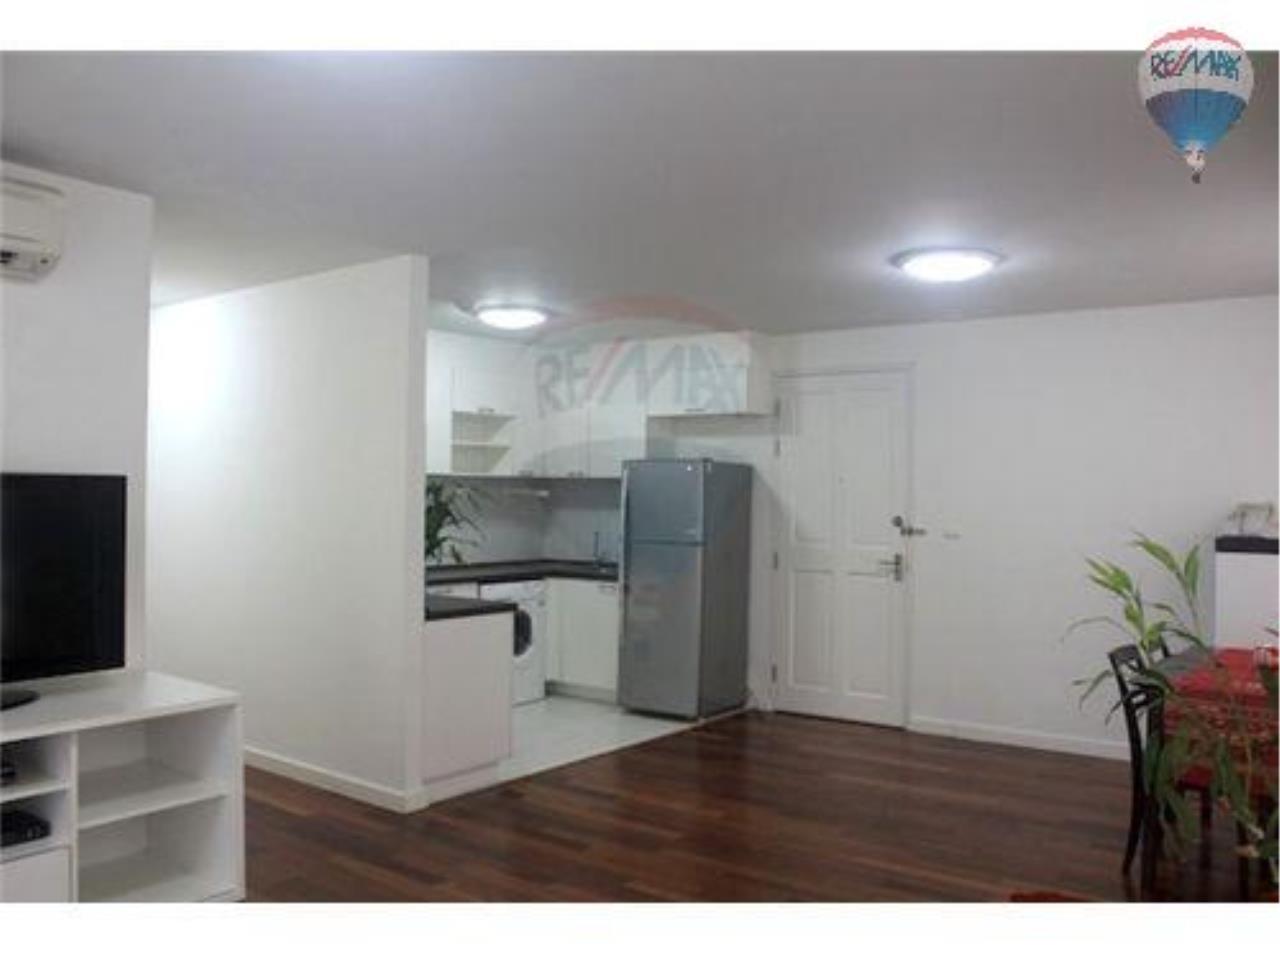 RE/MAX Properties Agency's 2 Bedroom Apartment- Sukhumvit Soi 49 4